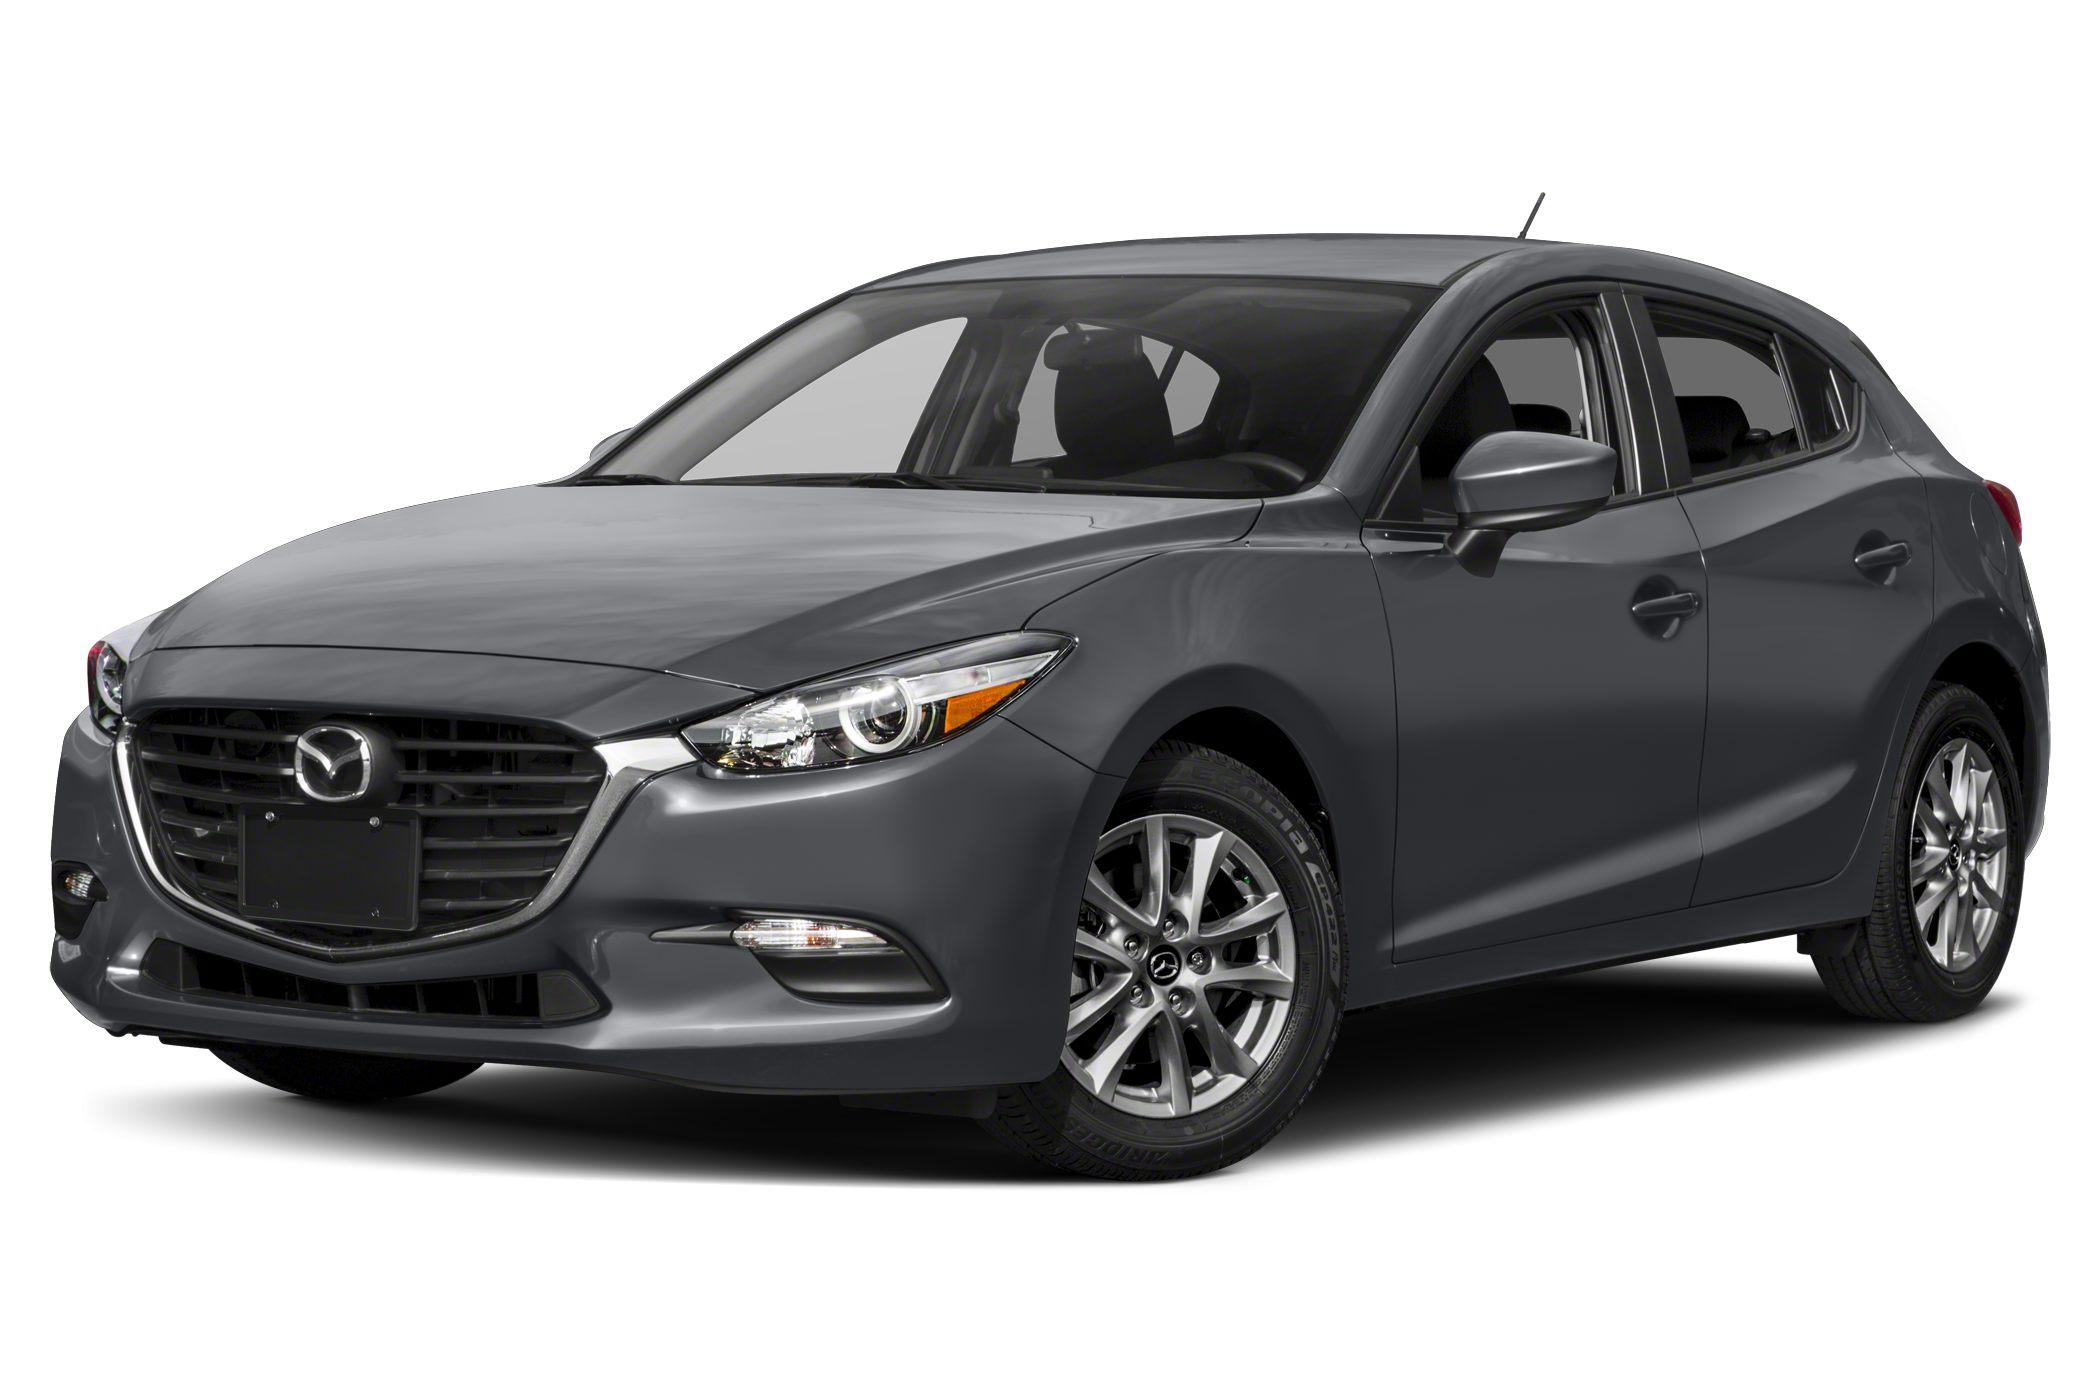 2017 Mazda Mazda3 Photos